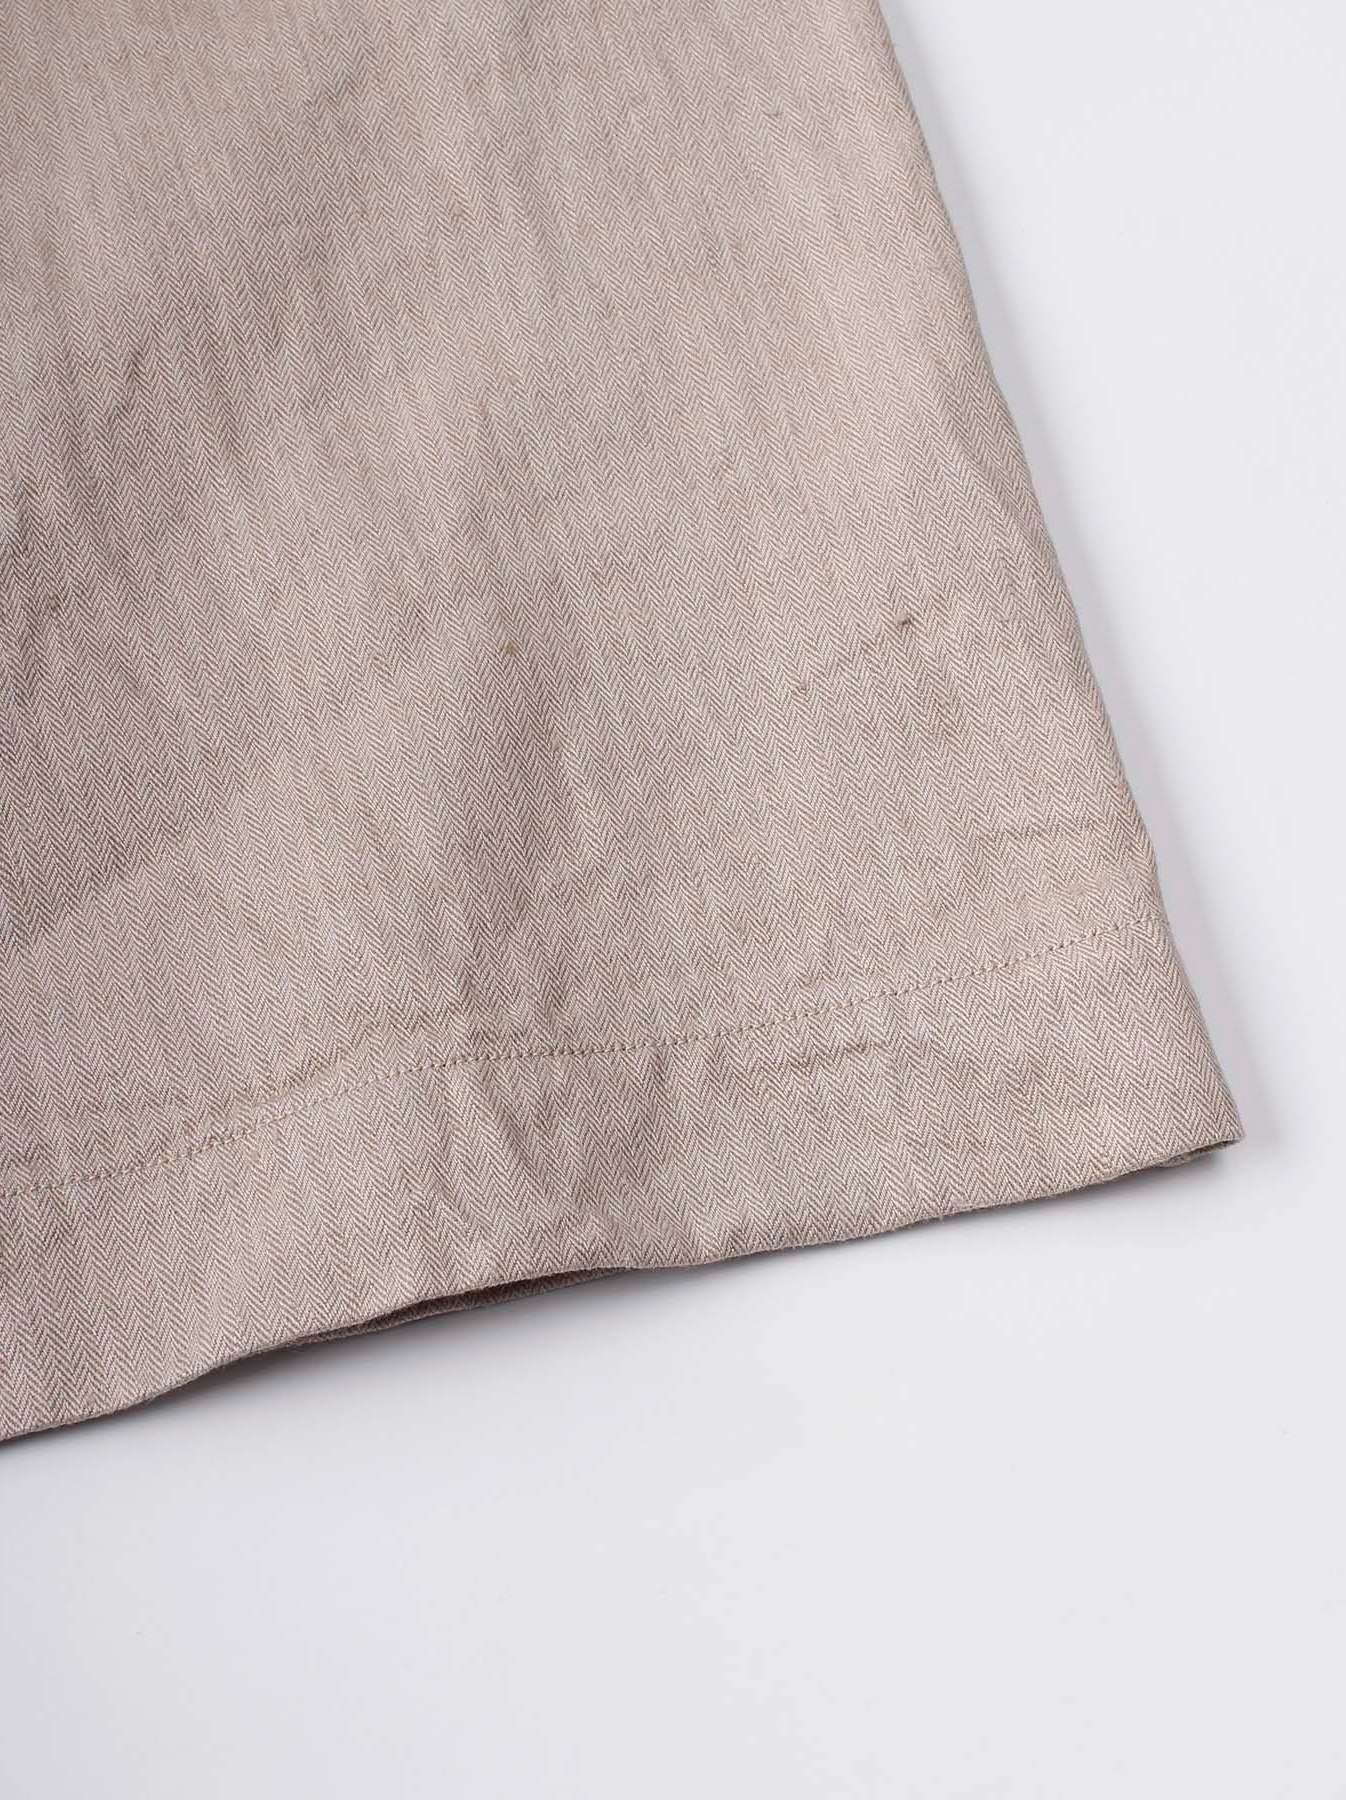 WH Linen Work3-5